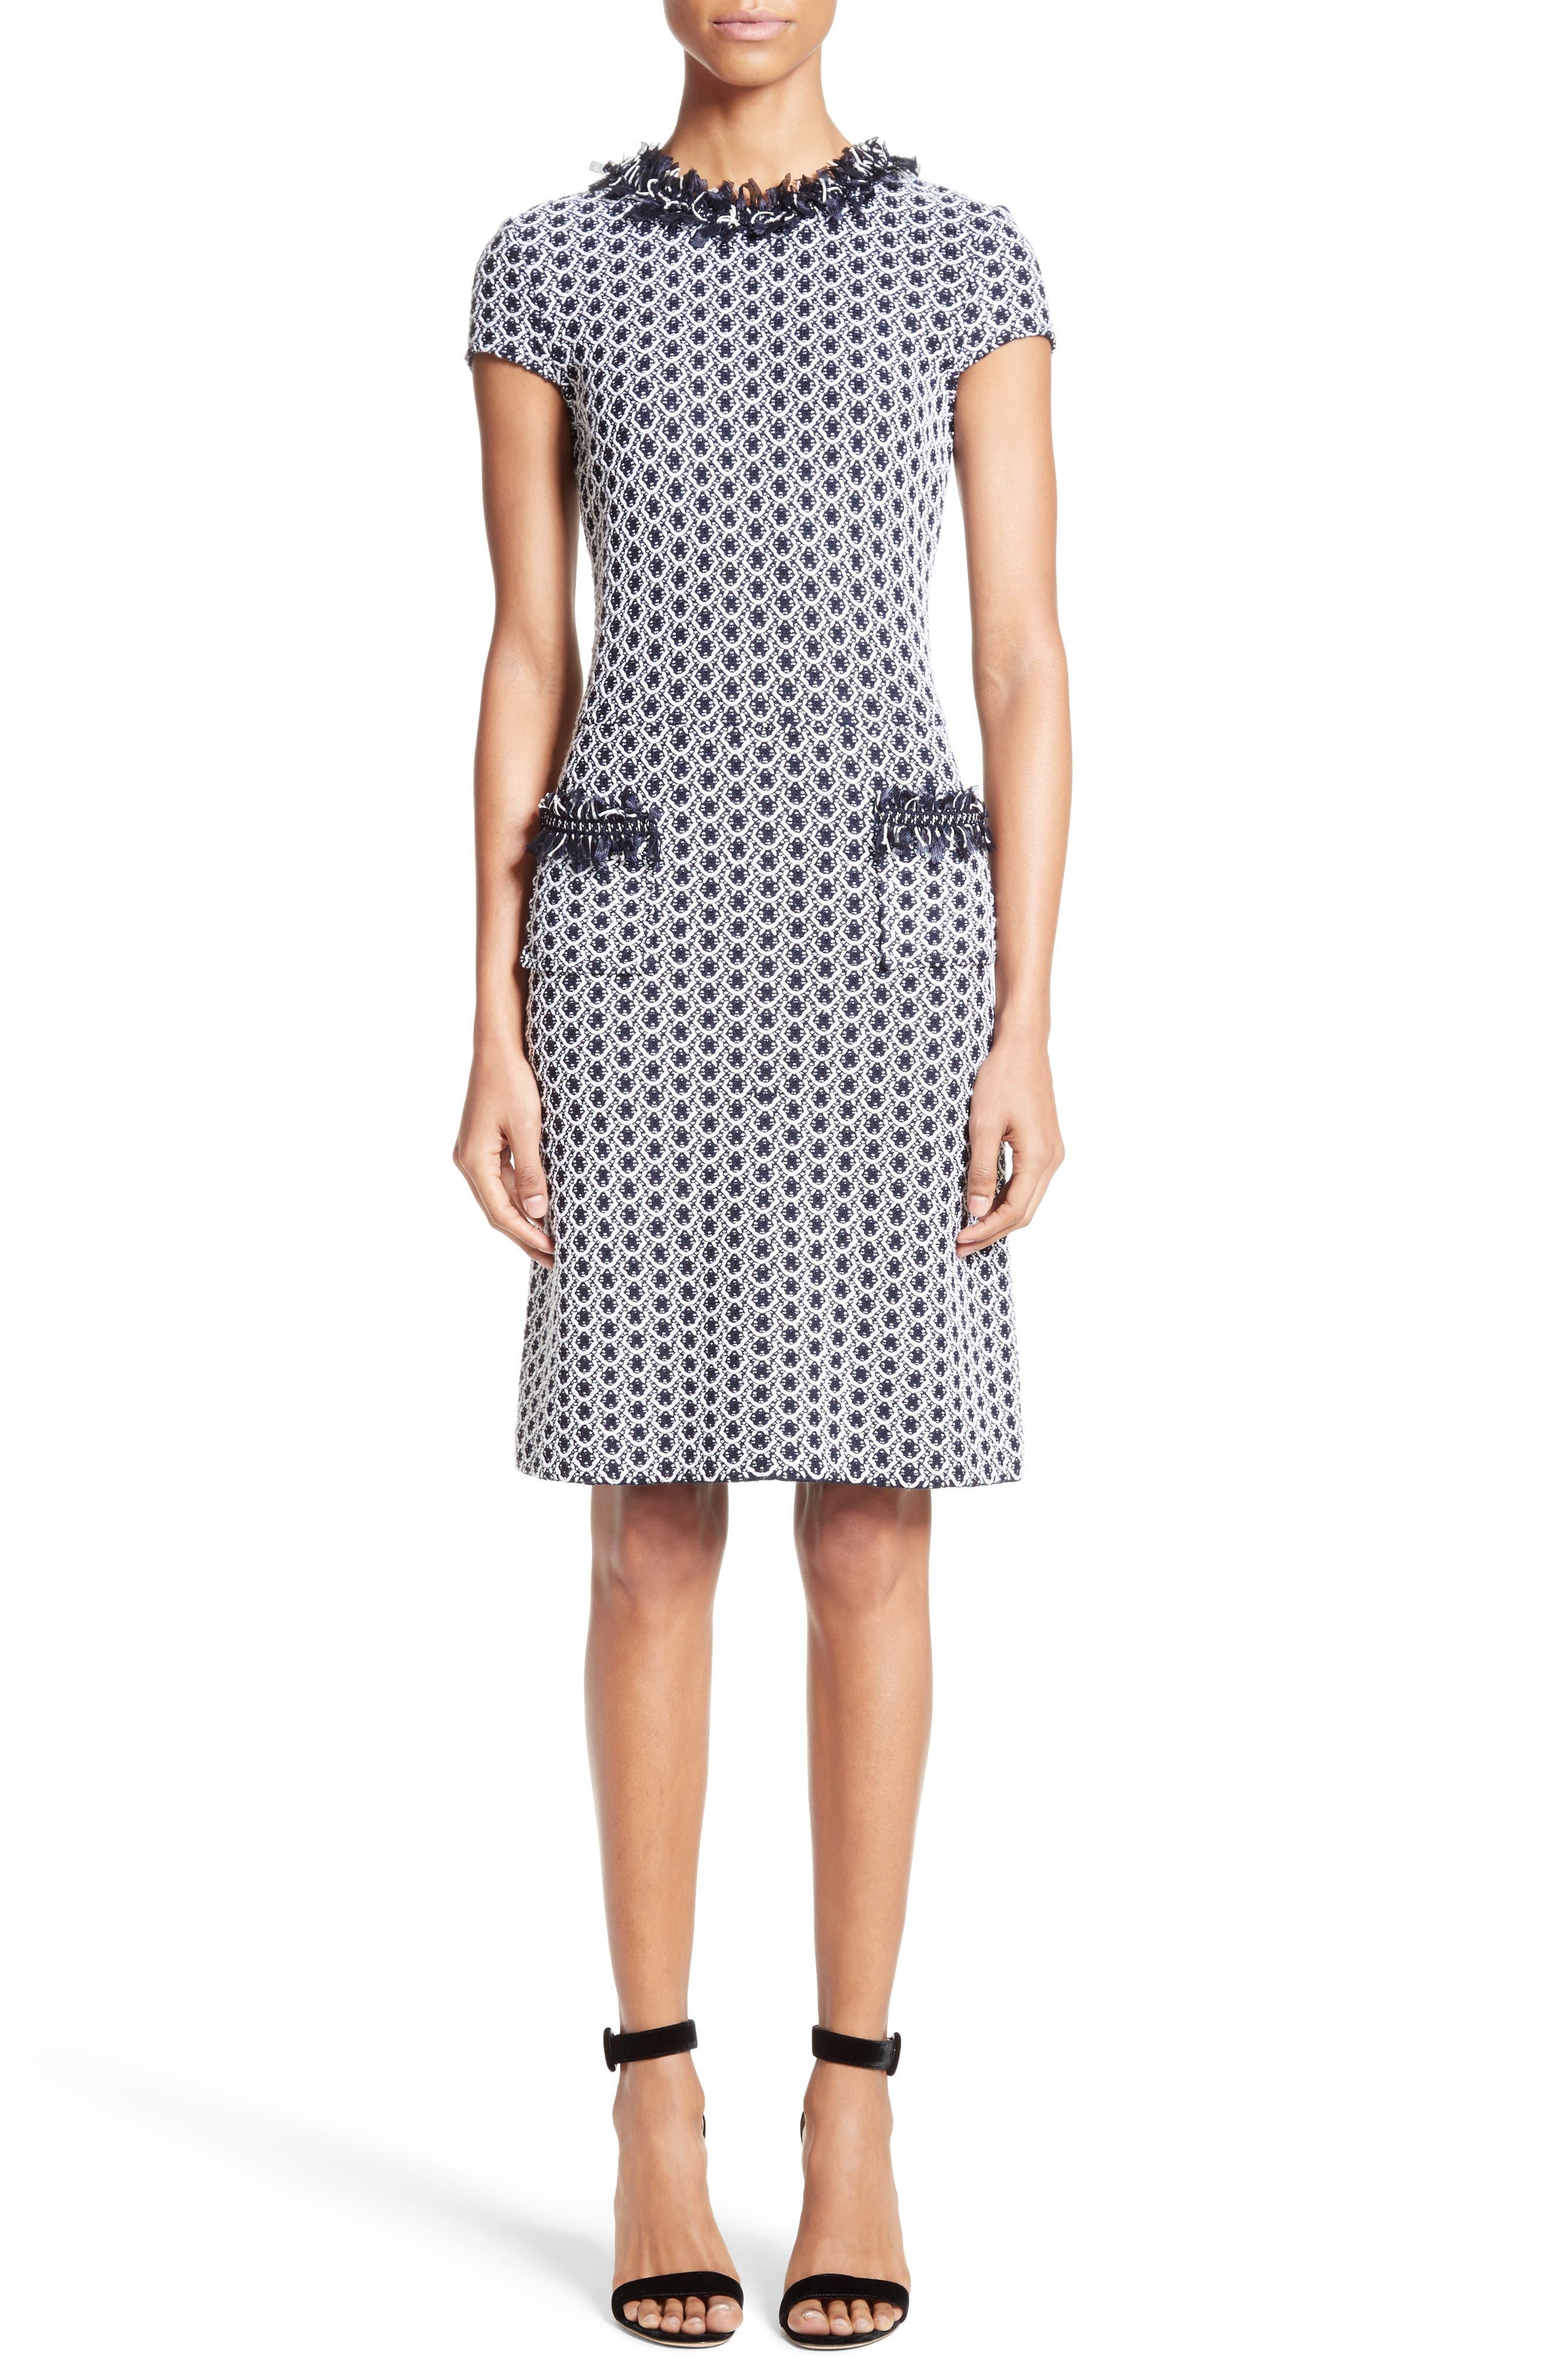 Aadi Tweed Knit Dress,                             Main thumbnail 1, color,                             400